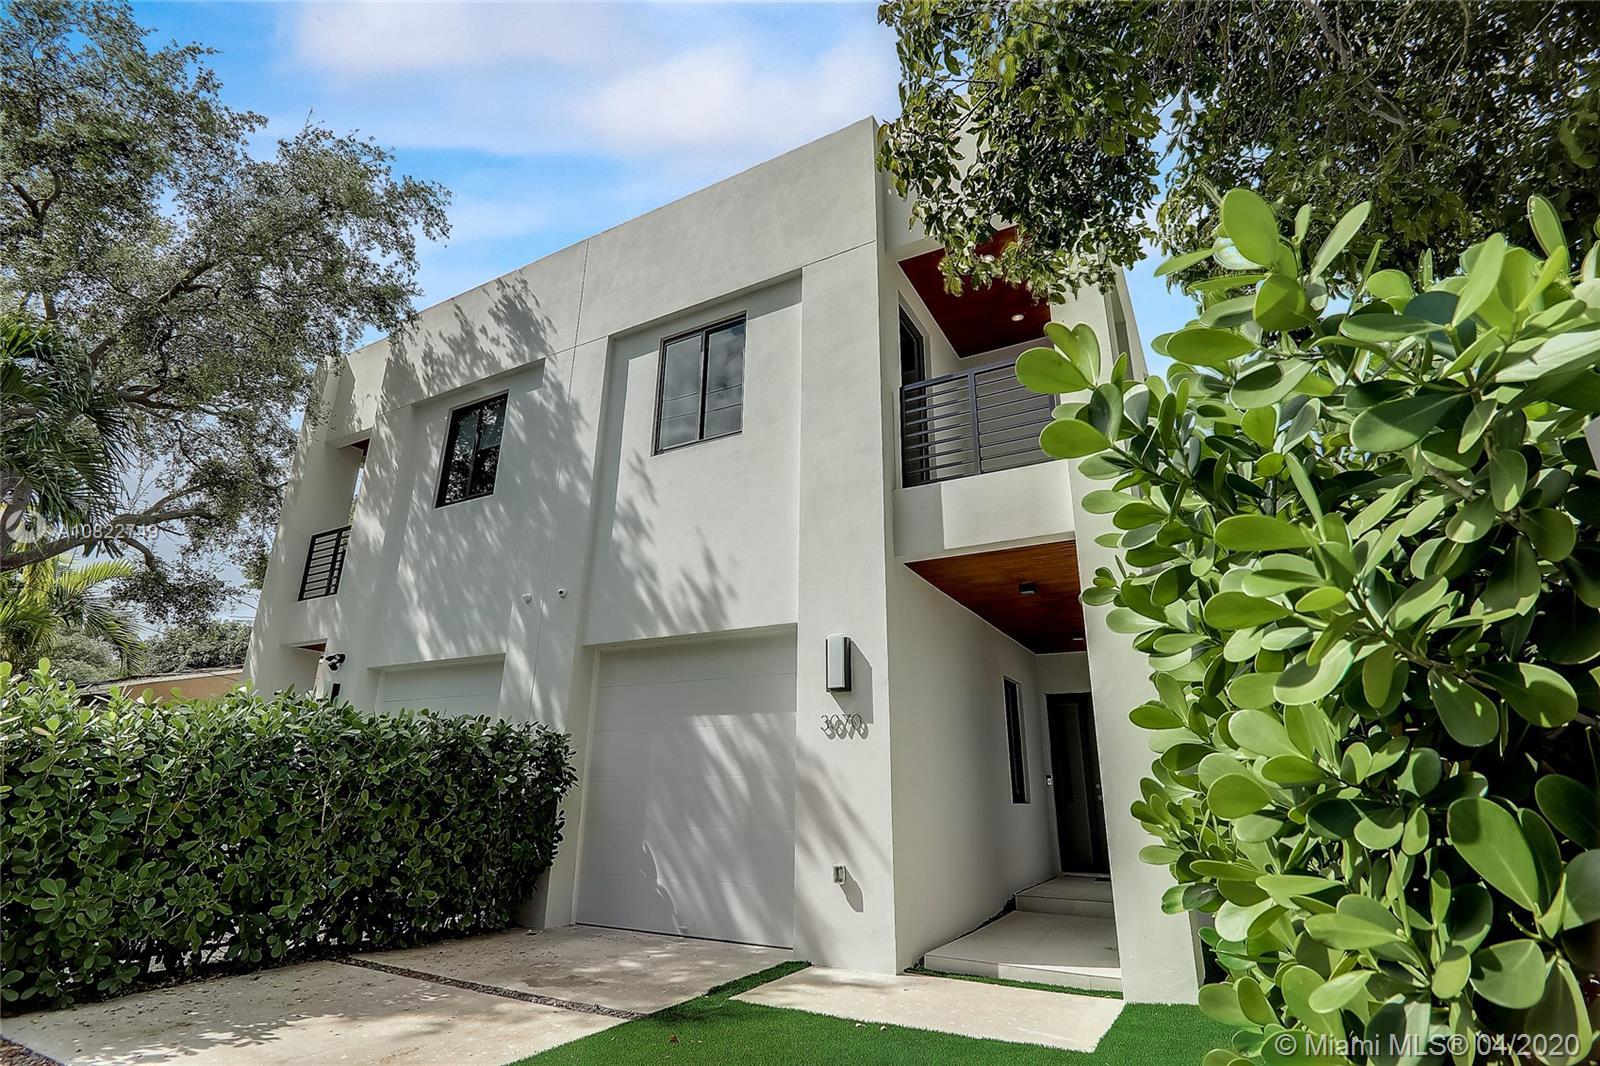 3070 Elizabeth St, 3070 - Coconut Grove, Florida